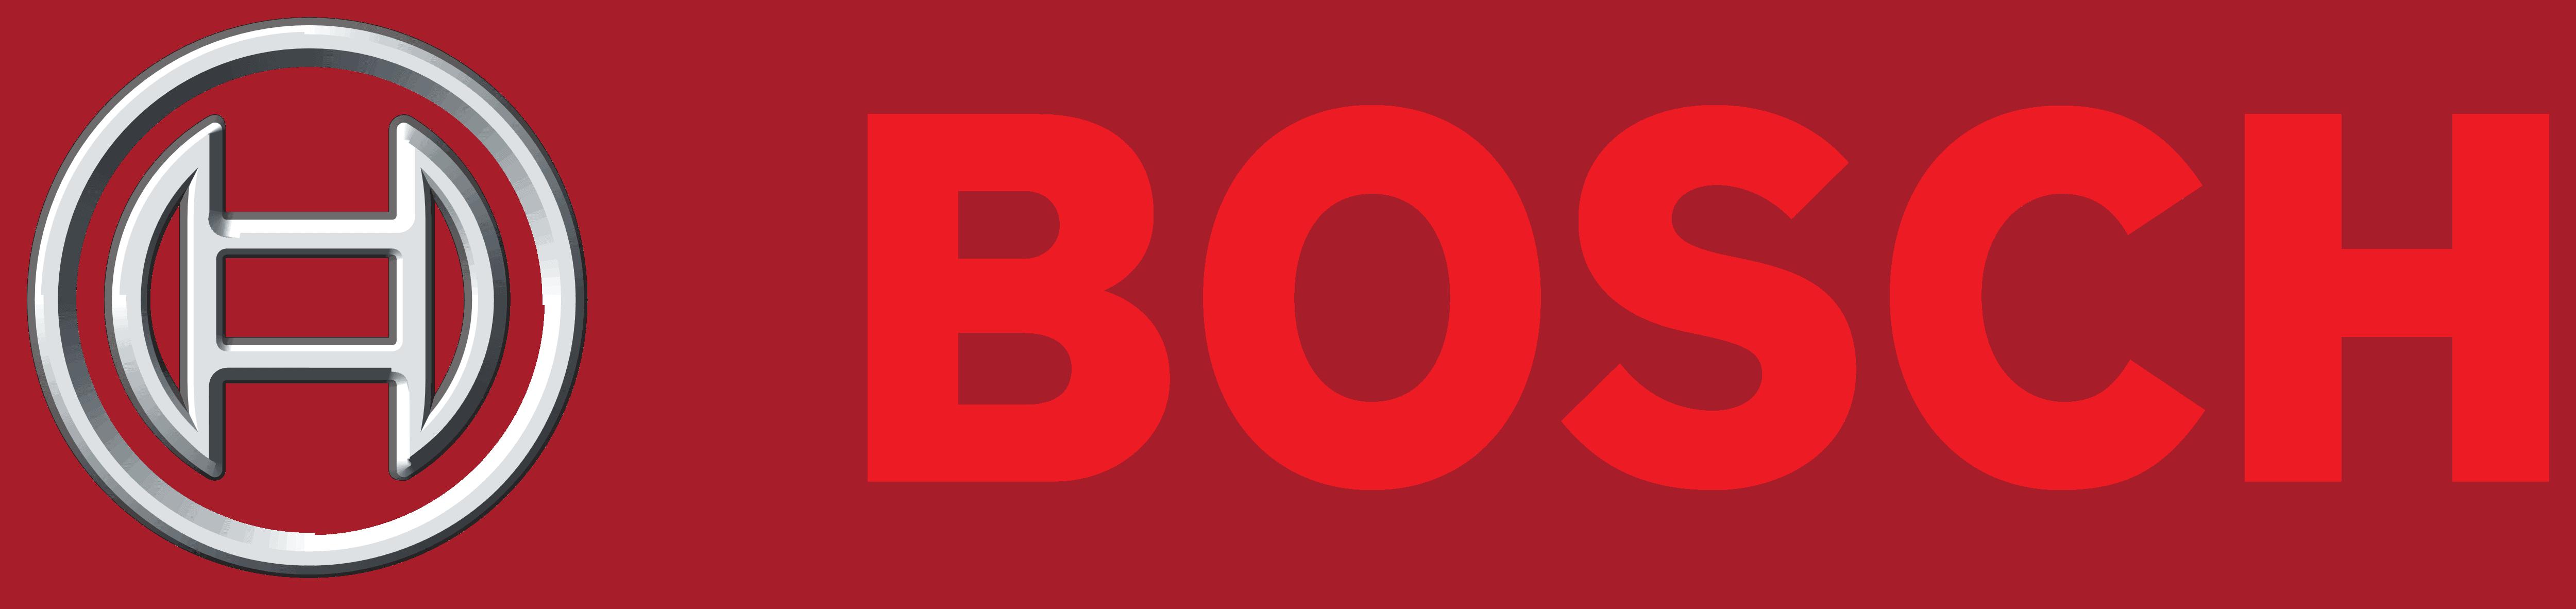 Buderus Bosch